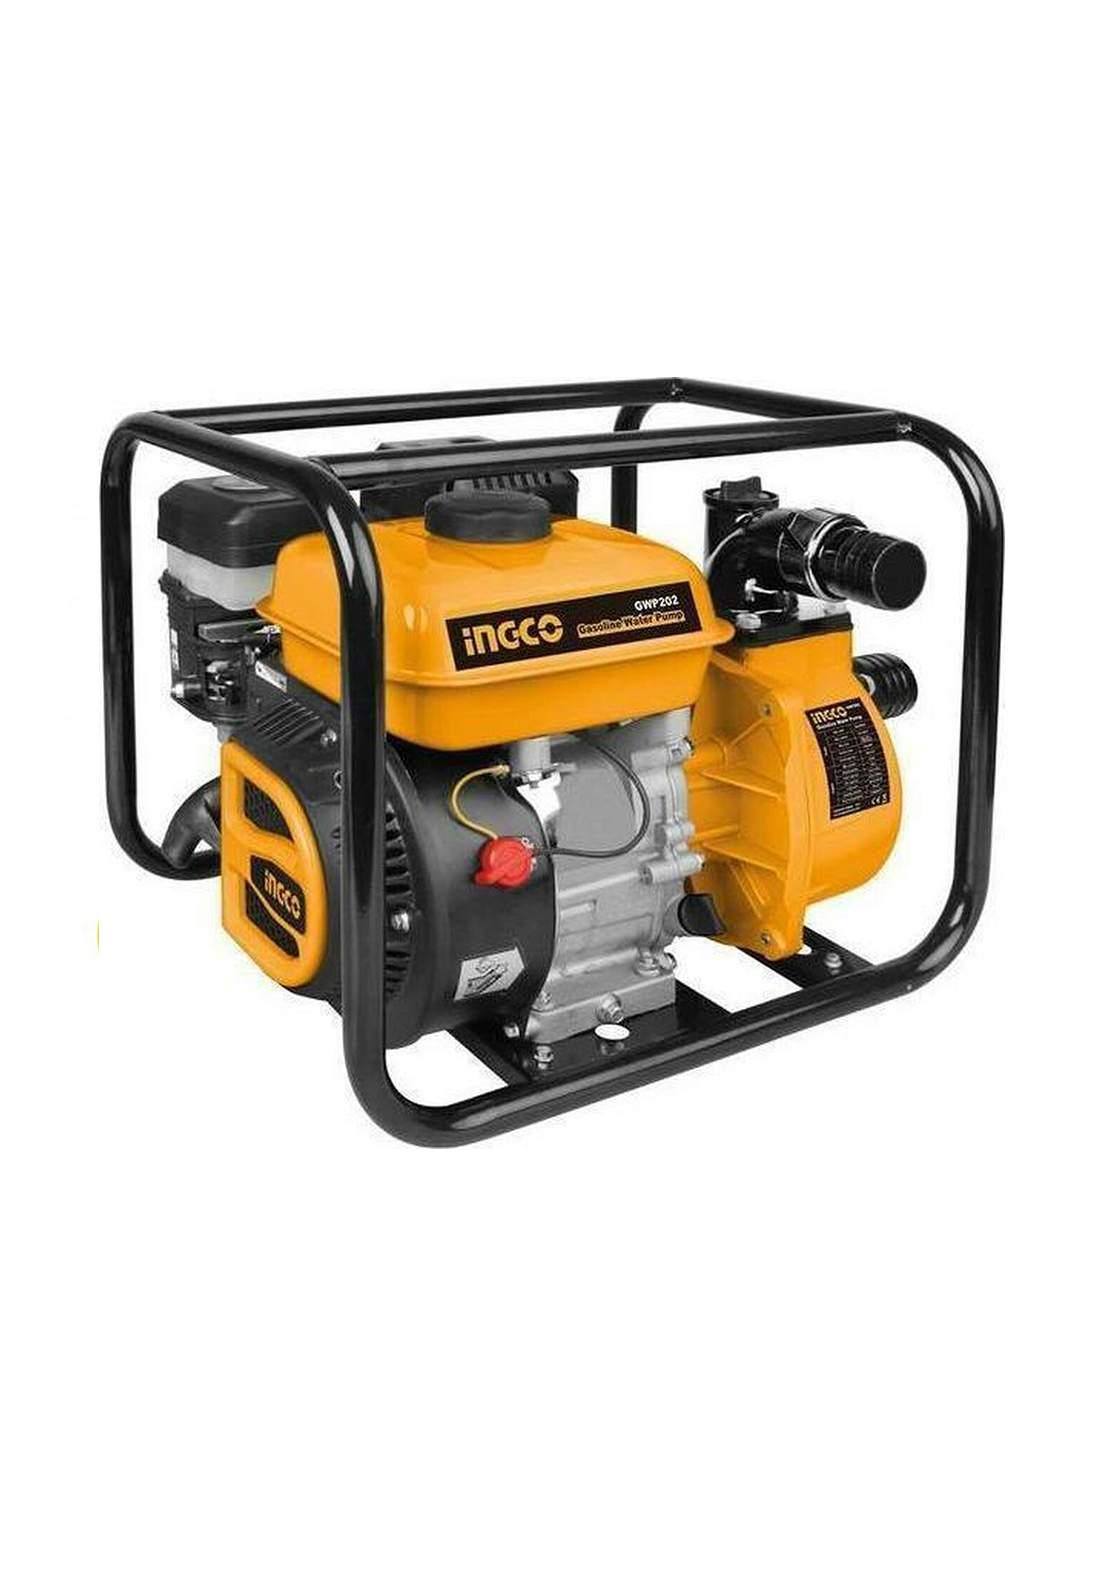 Ingco GWP202-1 Gasoline Water Pump 2.5HP 100L/min ماطور ماء زراعي